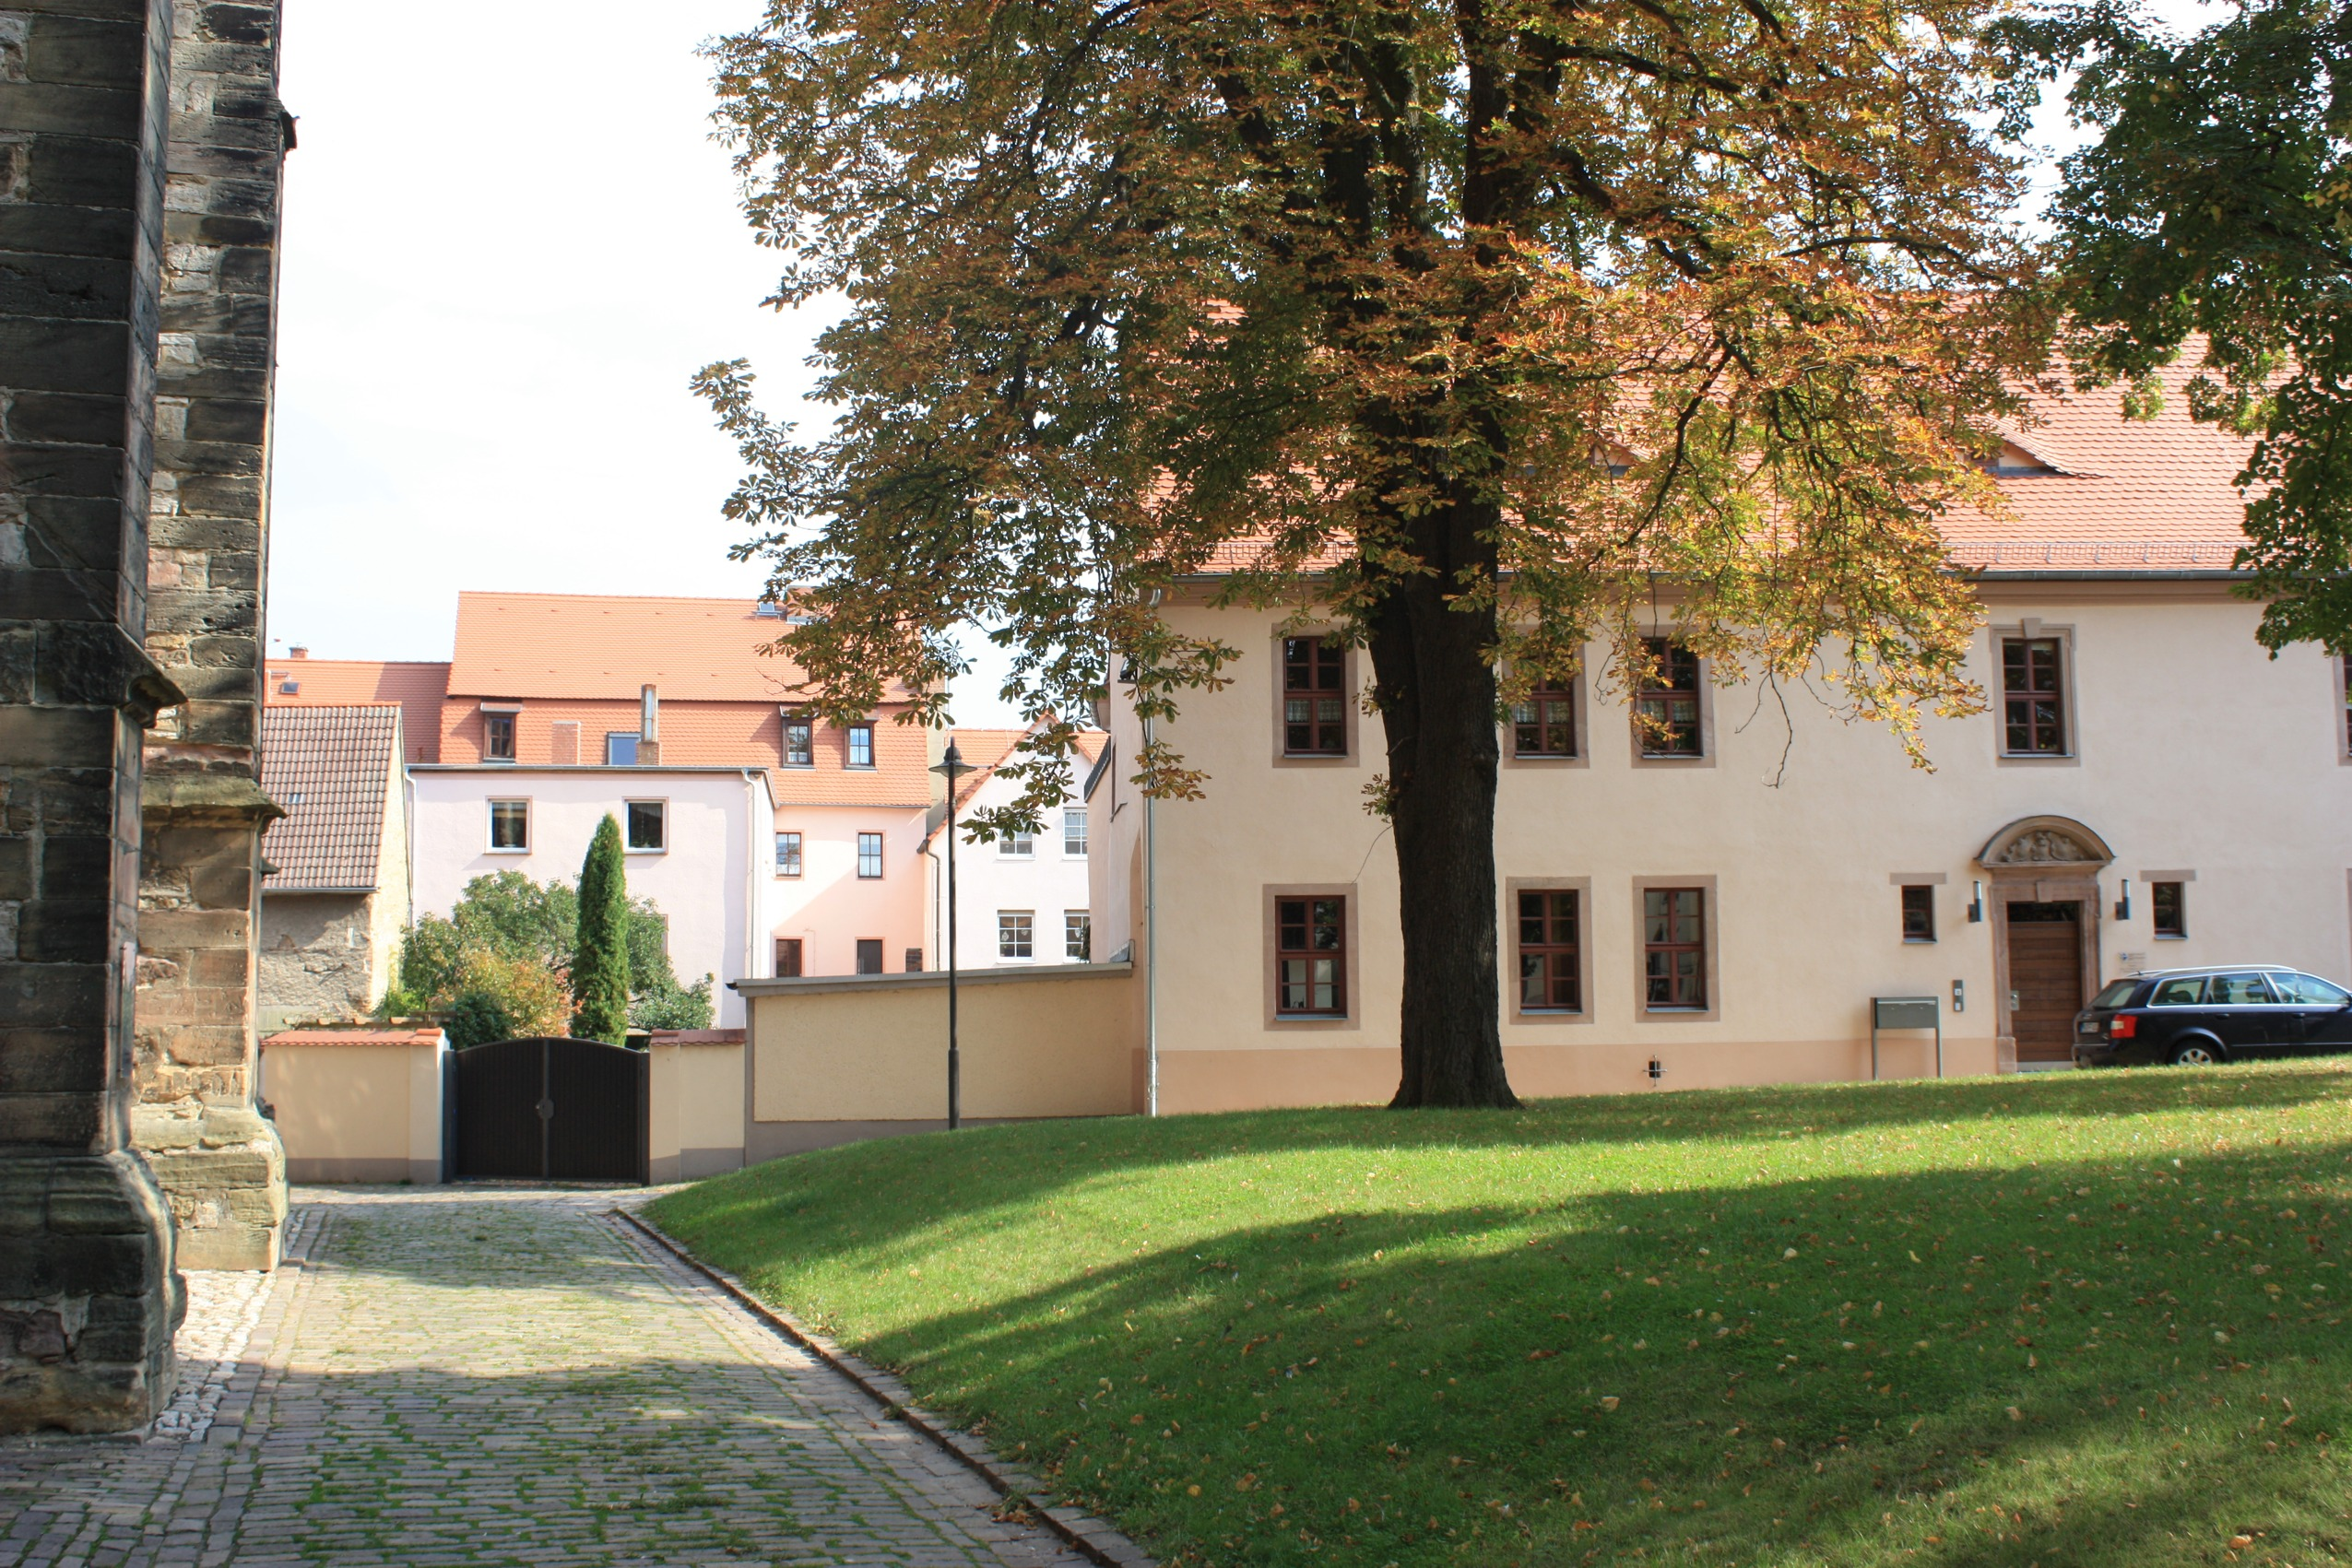 File:Querfurt, das Haus Kirchplan 2.jpg Wikimedia Commons